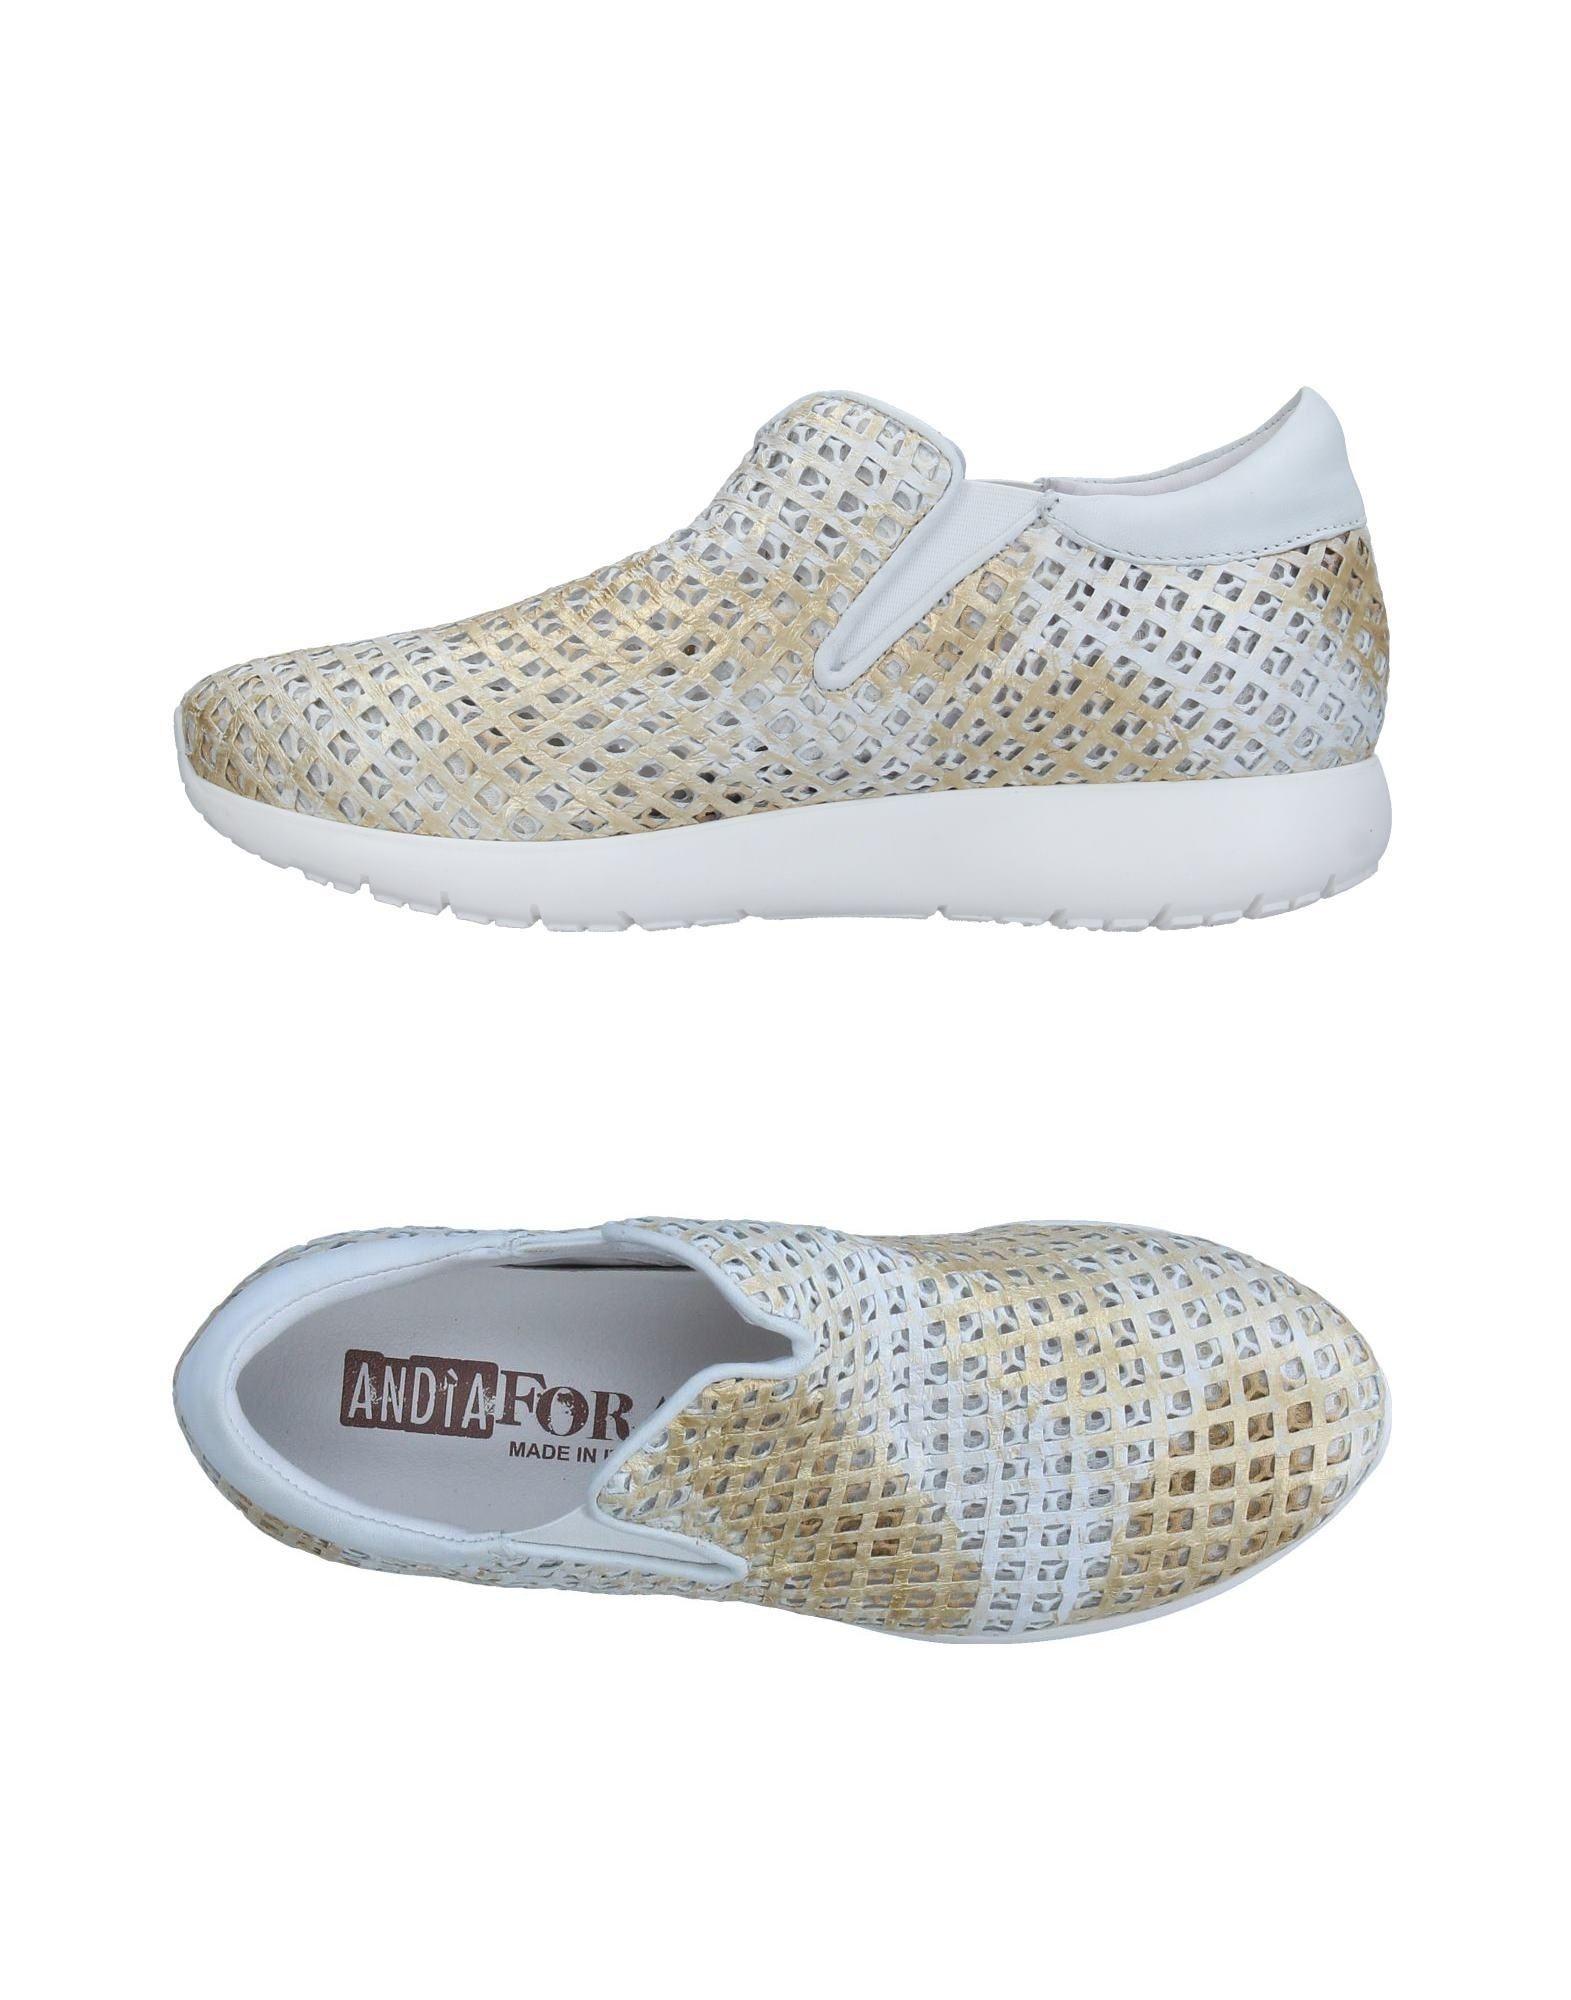 Andìa Fora Sneakers Damen Damen Sneakers  11337558MT 0f76e8